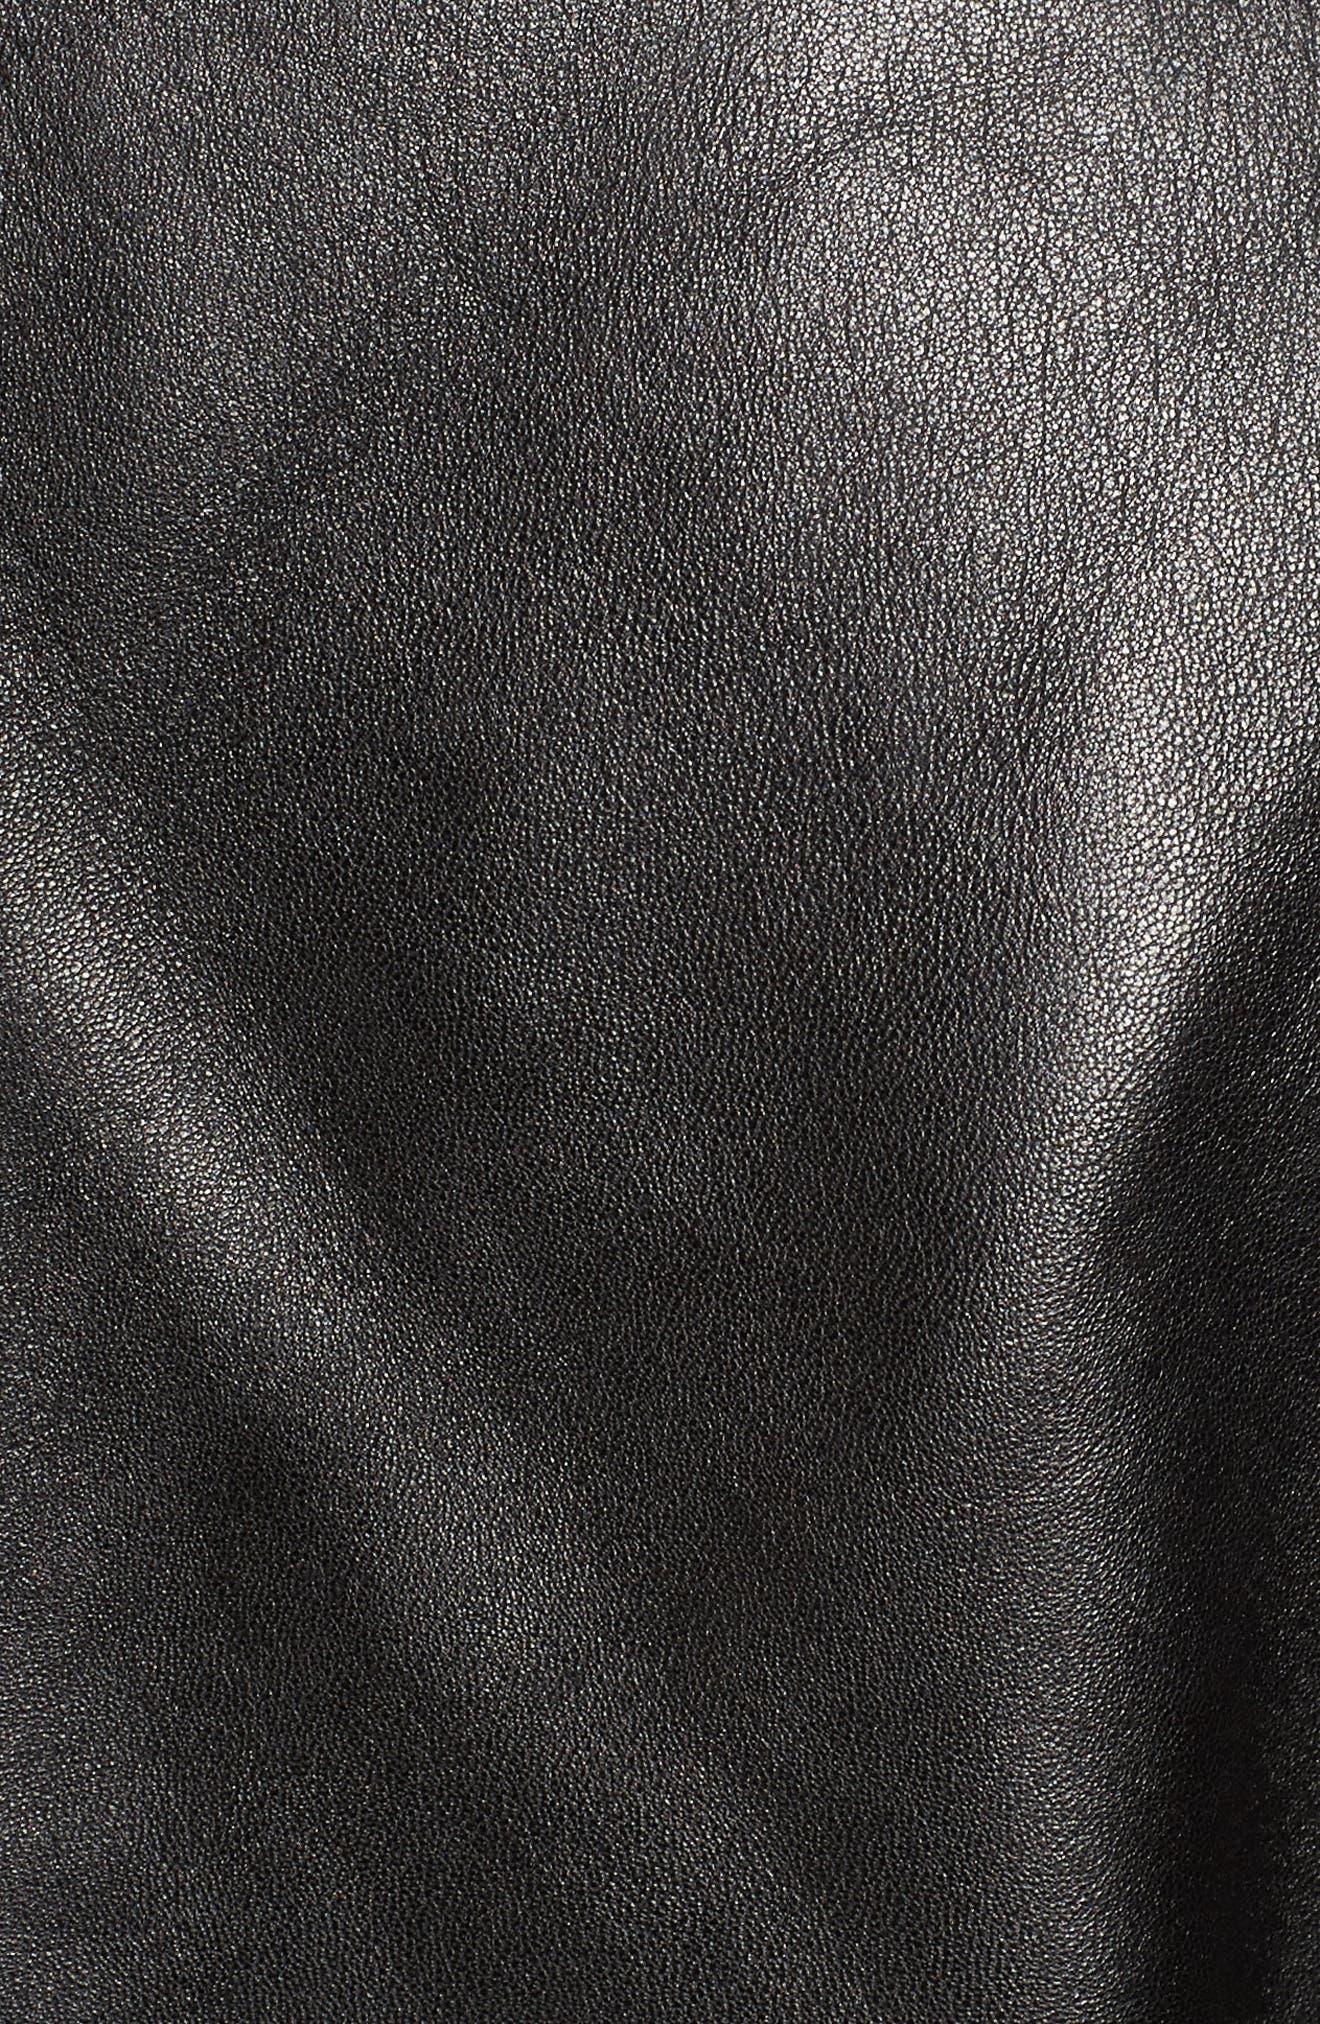 Laston Leather Moto Jacket,                             Alternate thumbnail 5, color,                             Black